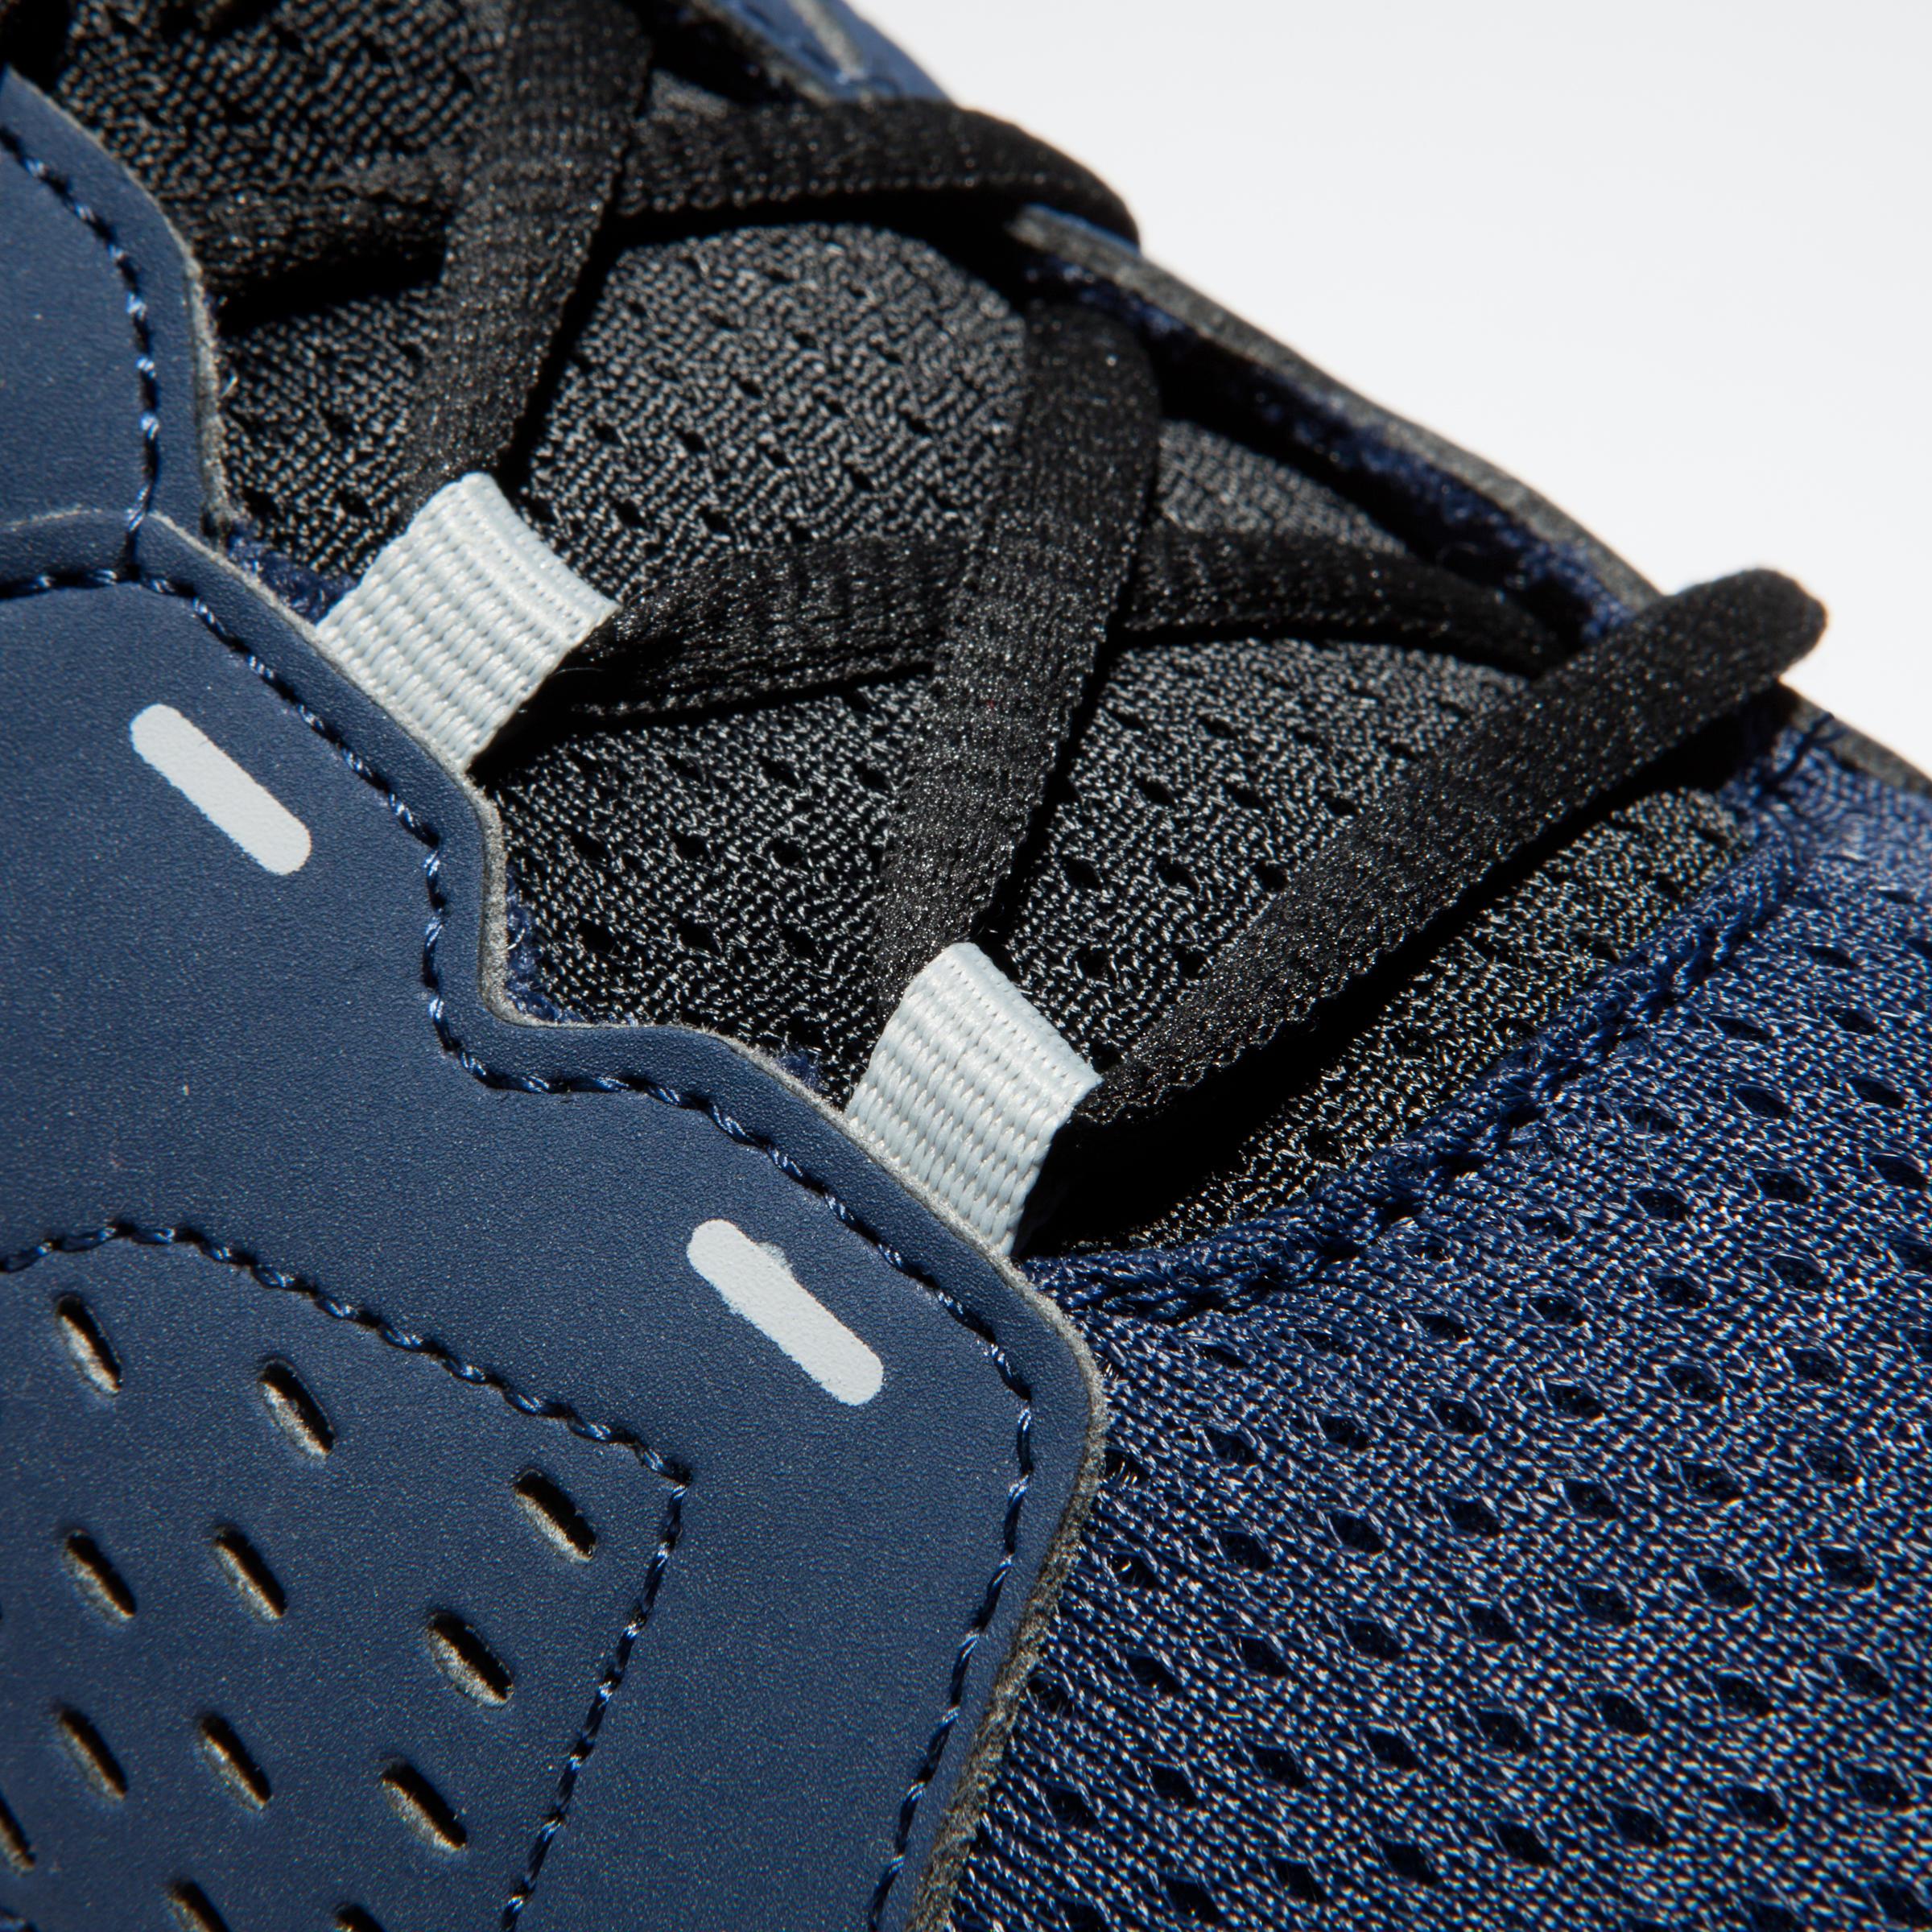 Training Chaussures Et Cardio 100 Fitness Homme Bleu Noir TK1c5luFJ3